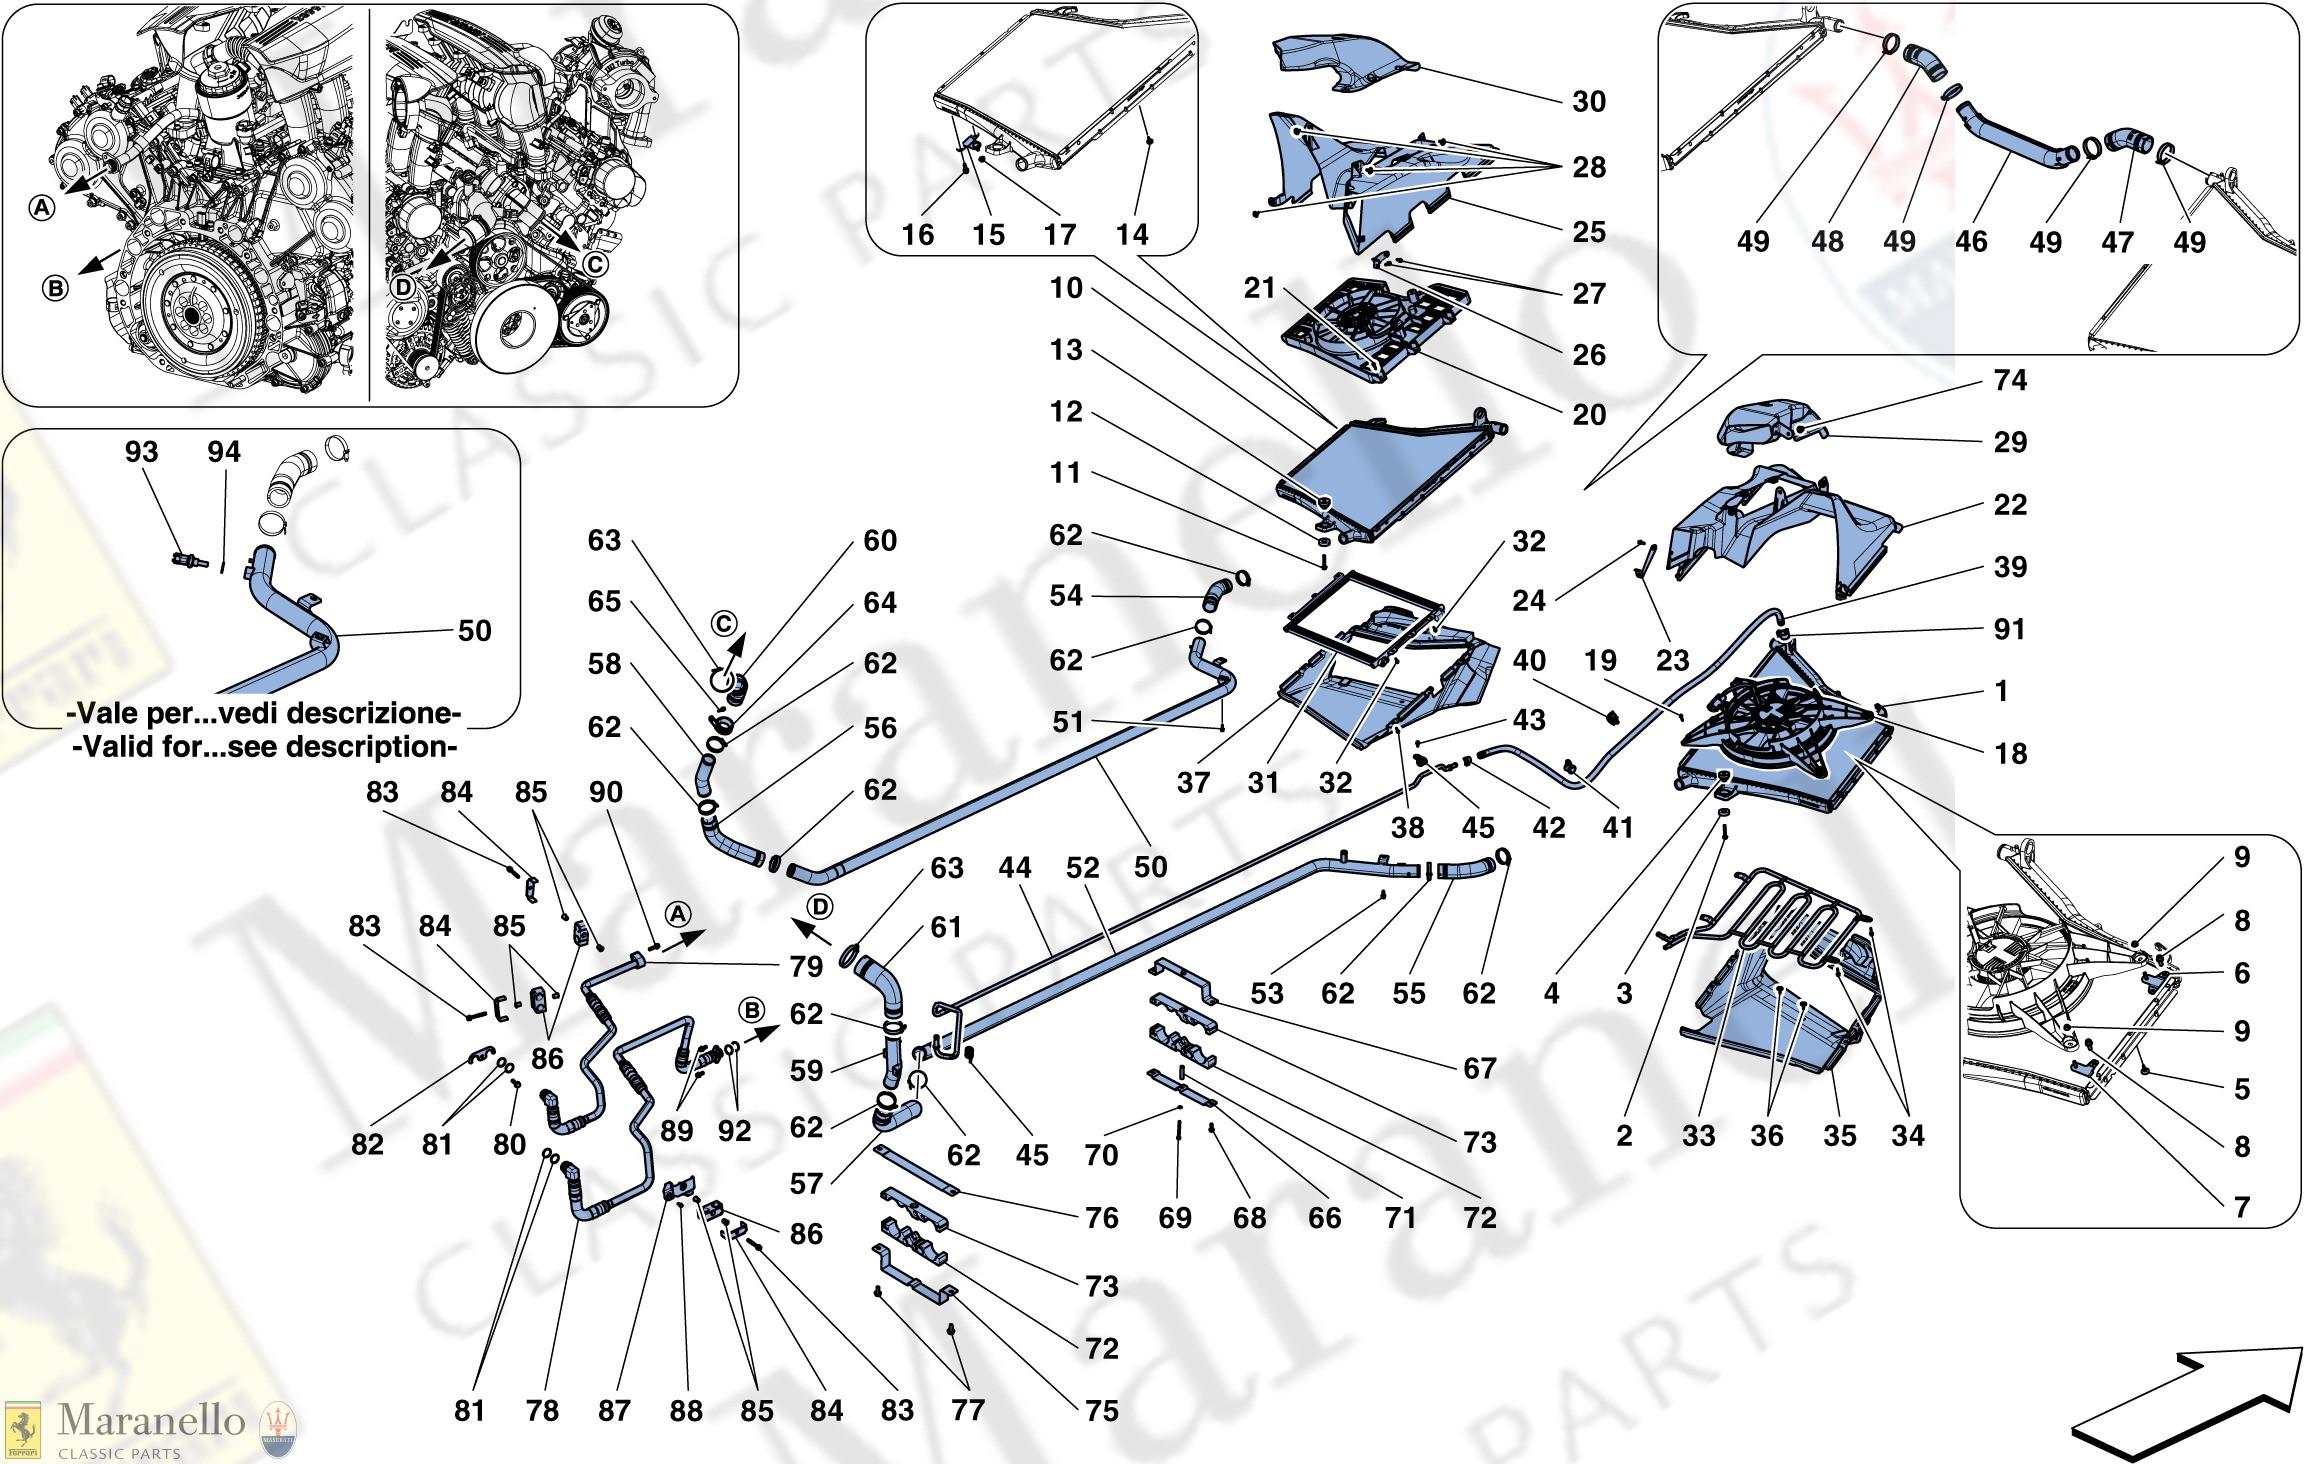 Radiator Parts Diagram 025 Cooling Radiators and Air Ducts Parts Diagram for Of Radiator Parts Diagram